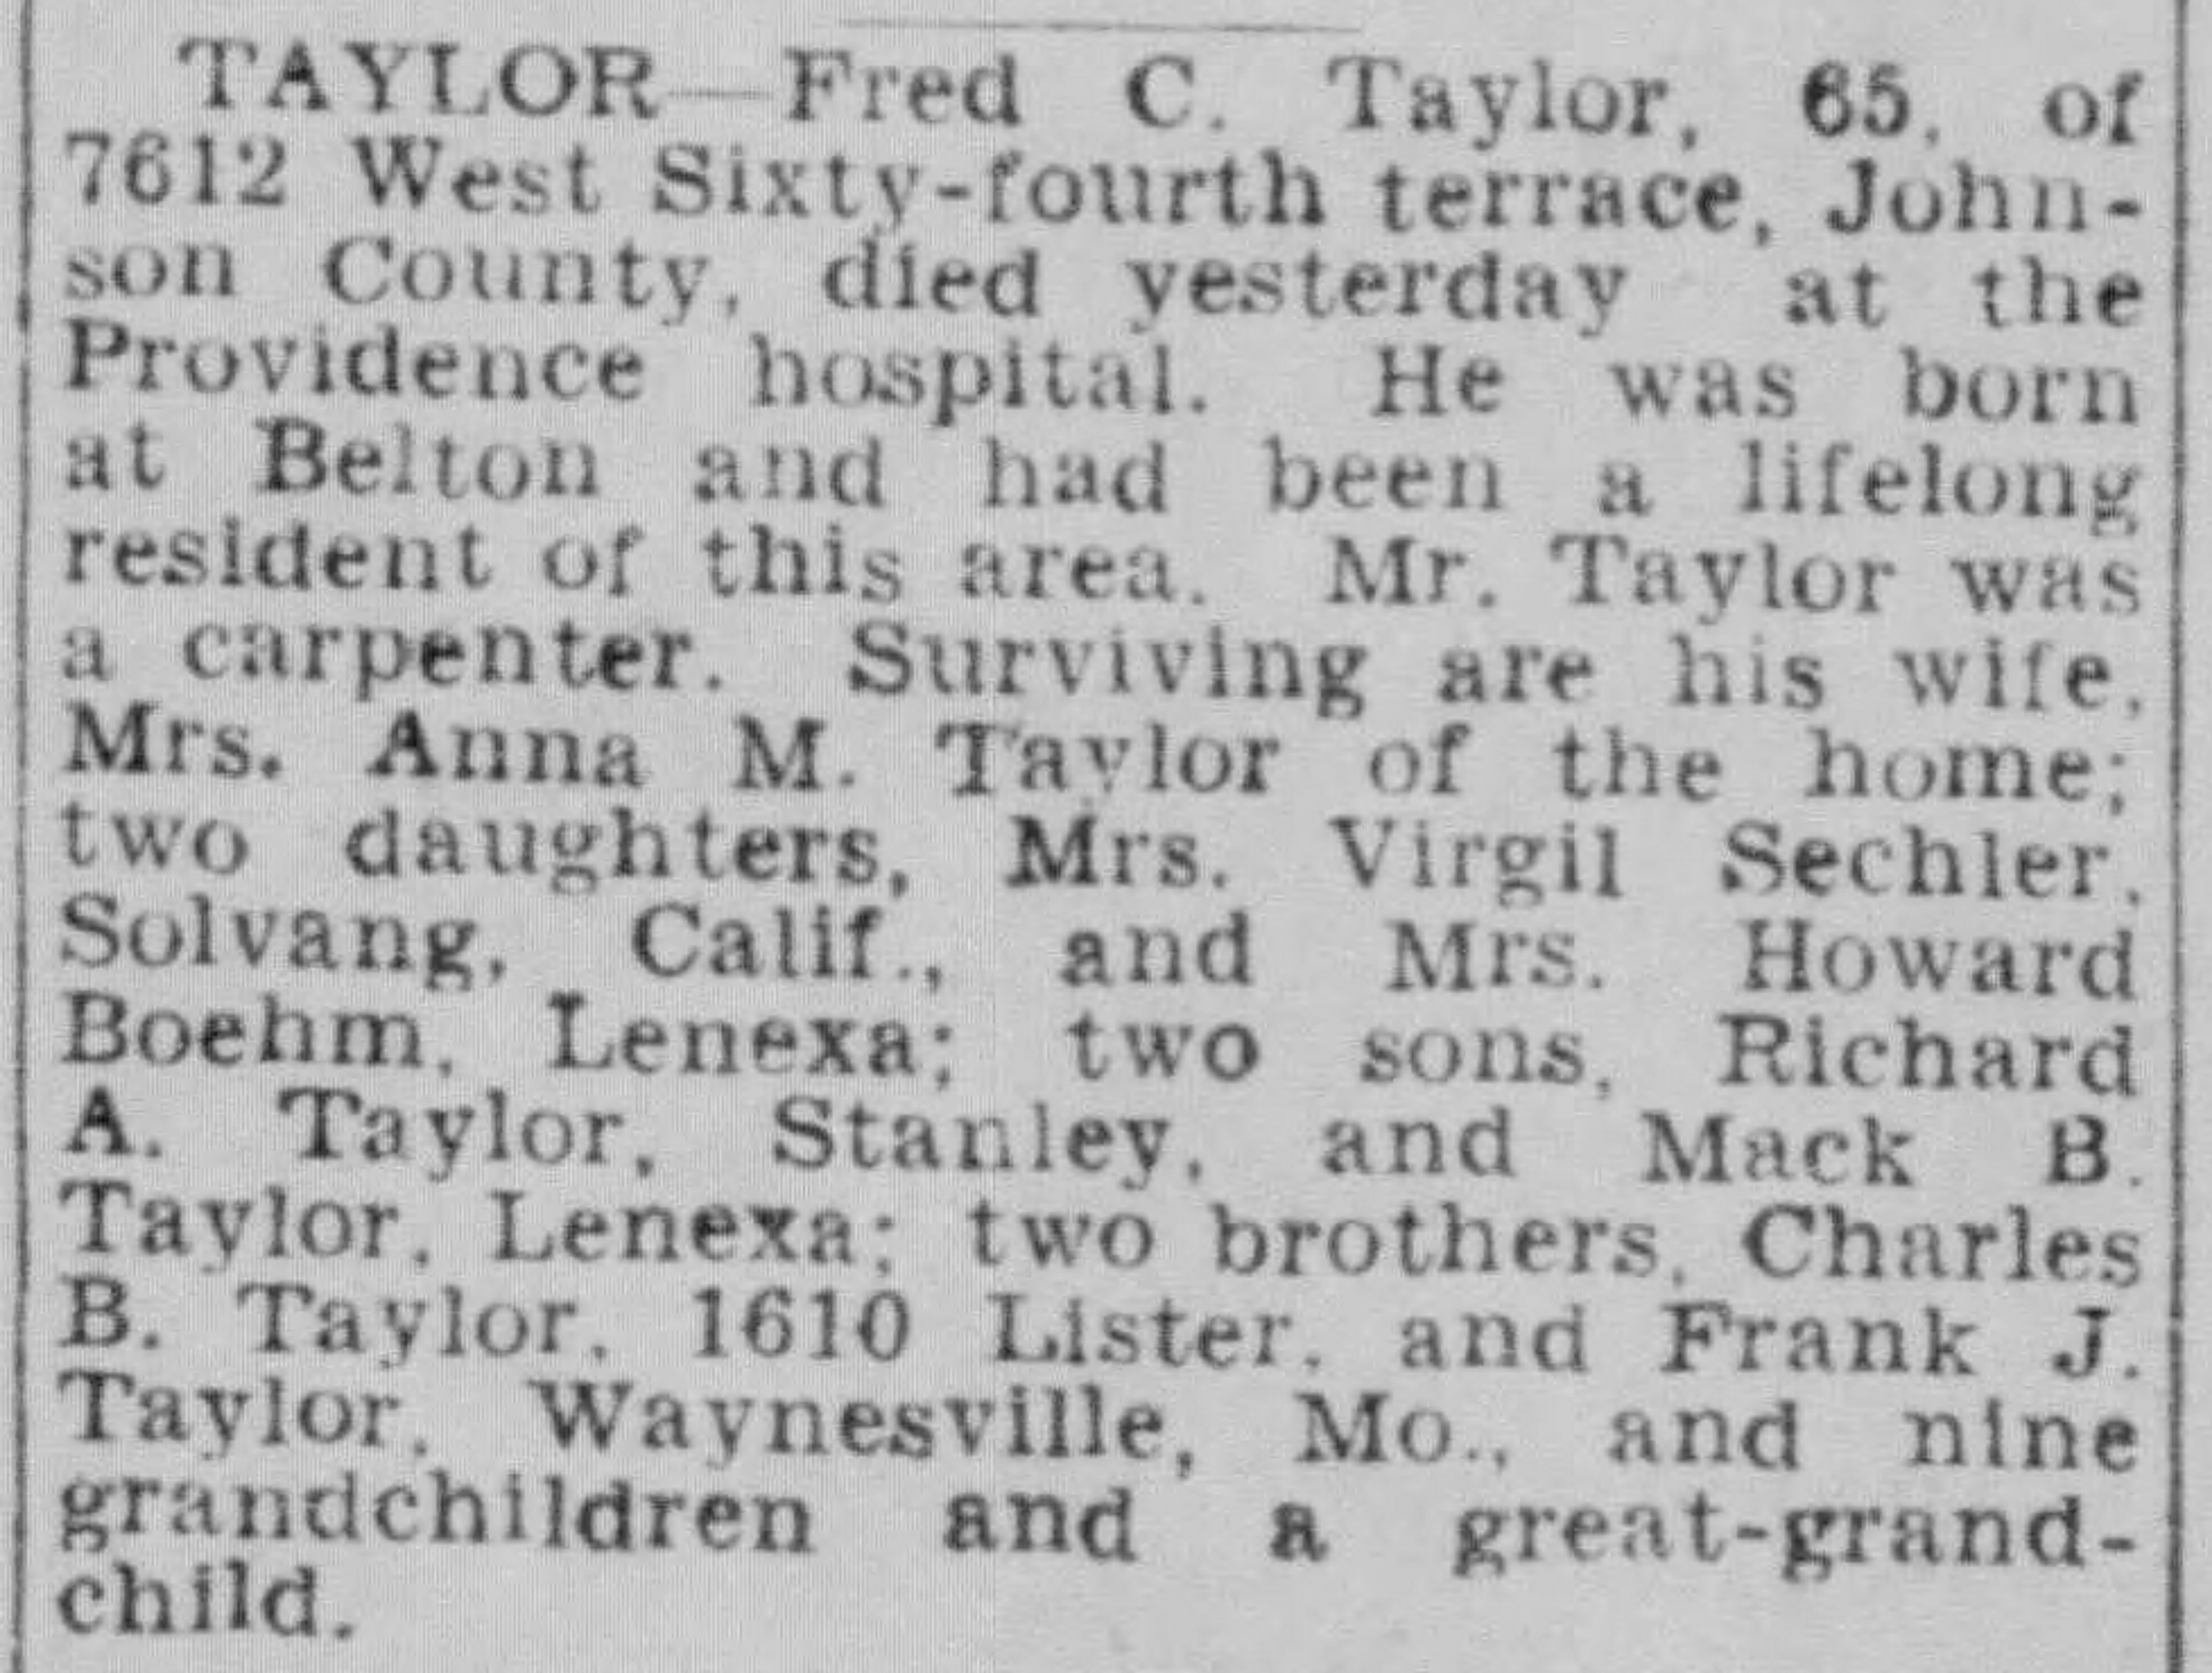 Frederick C Taylor